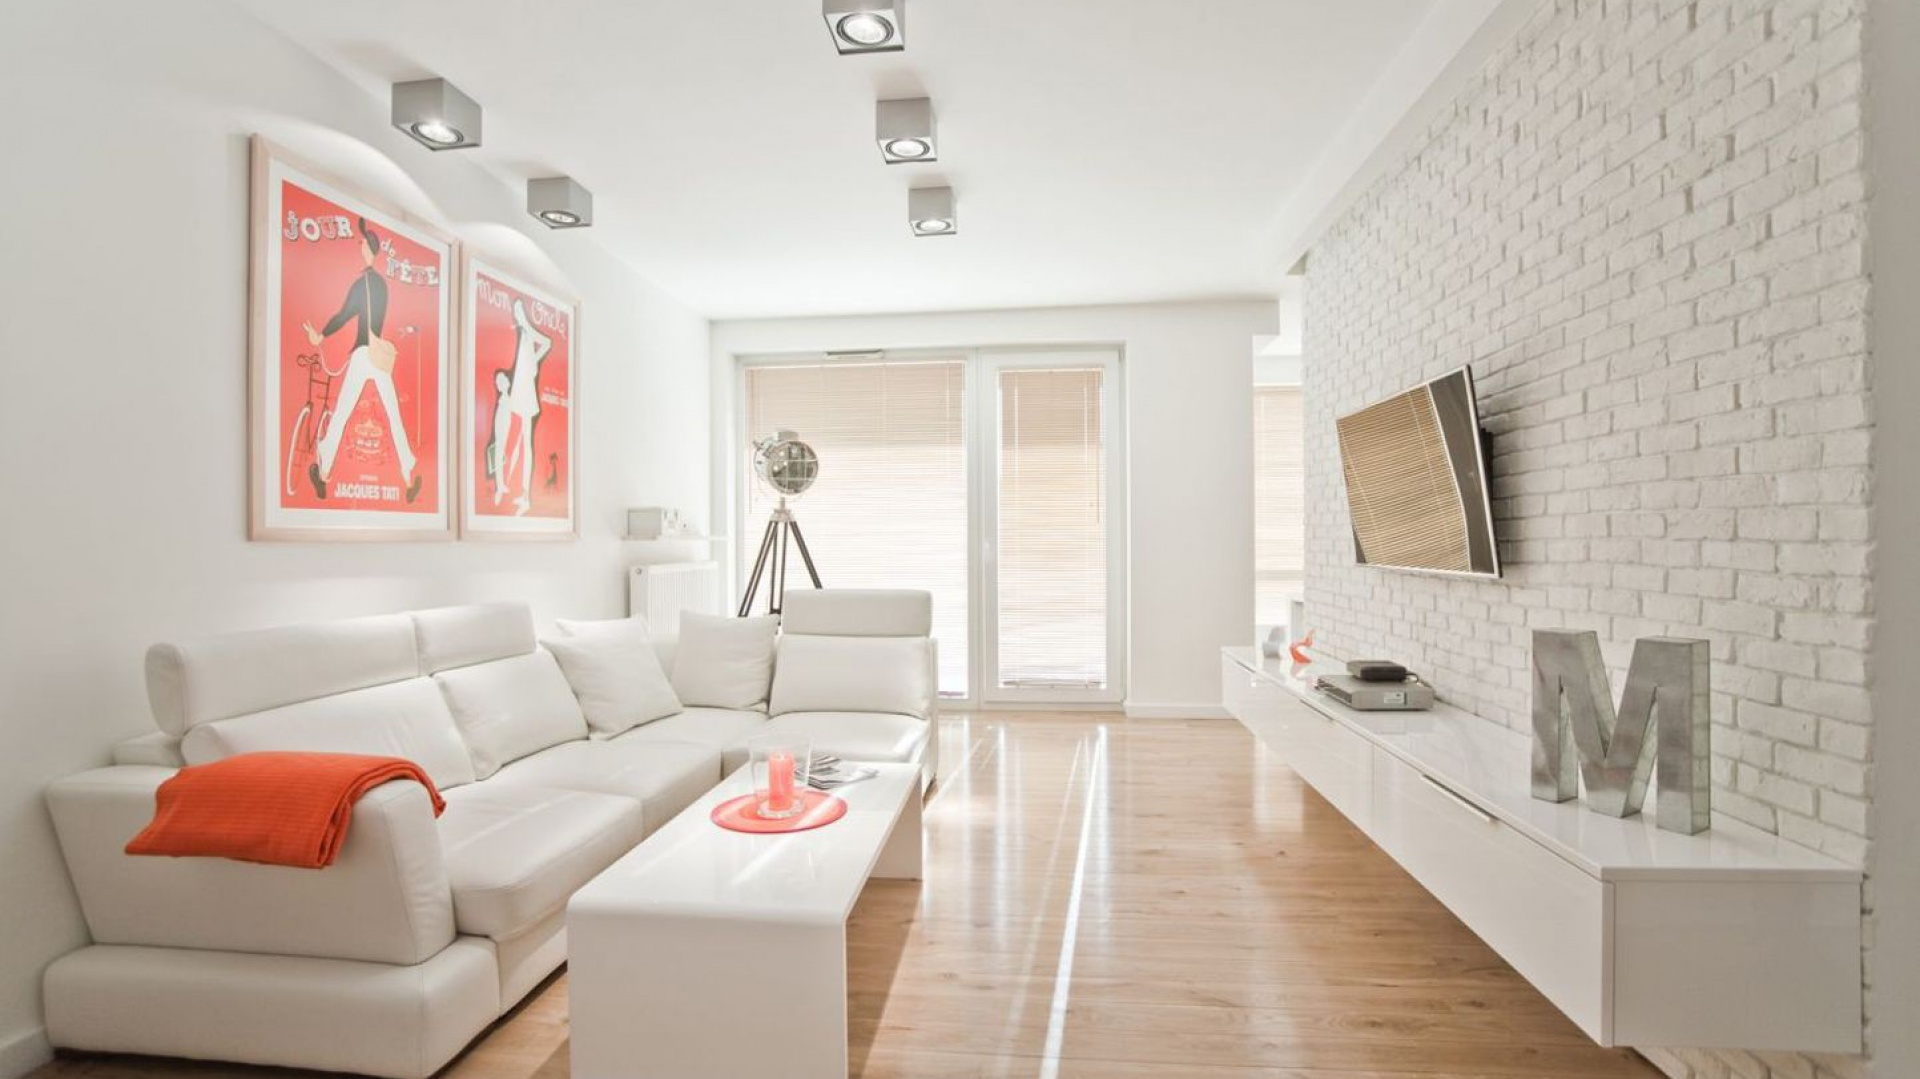 Salon w mieszkaniu 54 m². Projekt Boho Studio. Fot. Archiconnect.pl